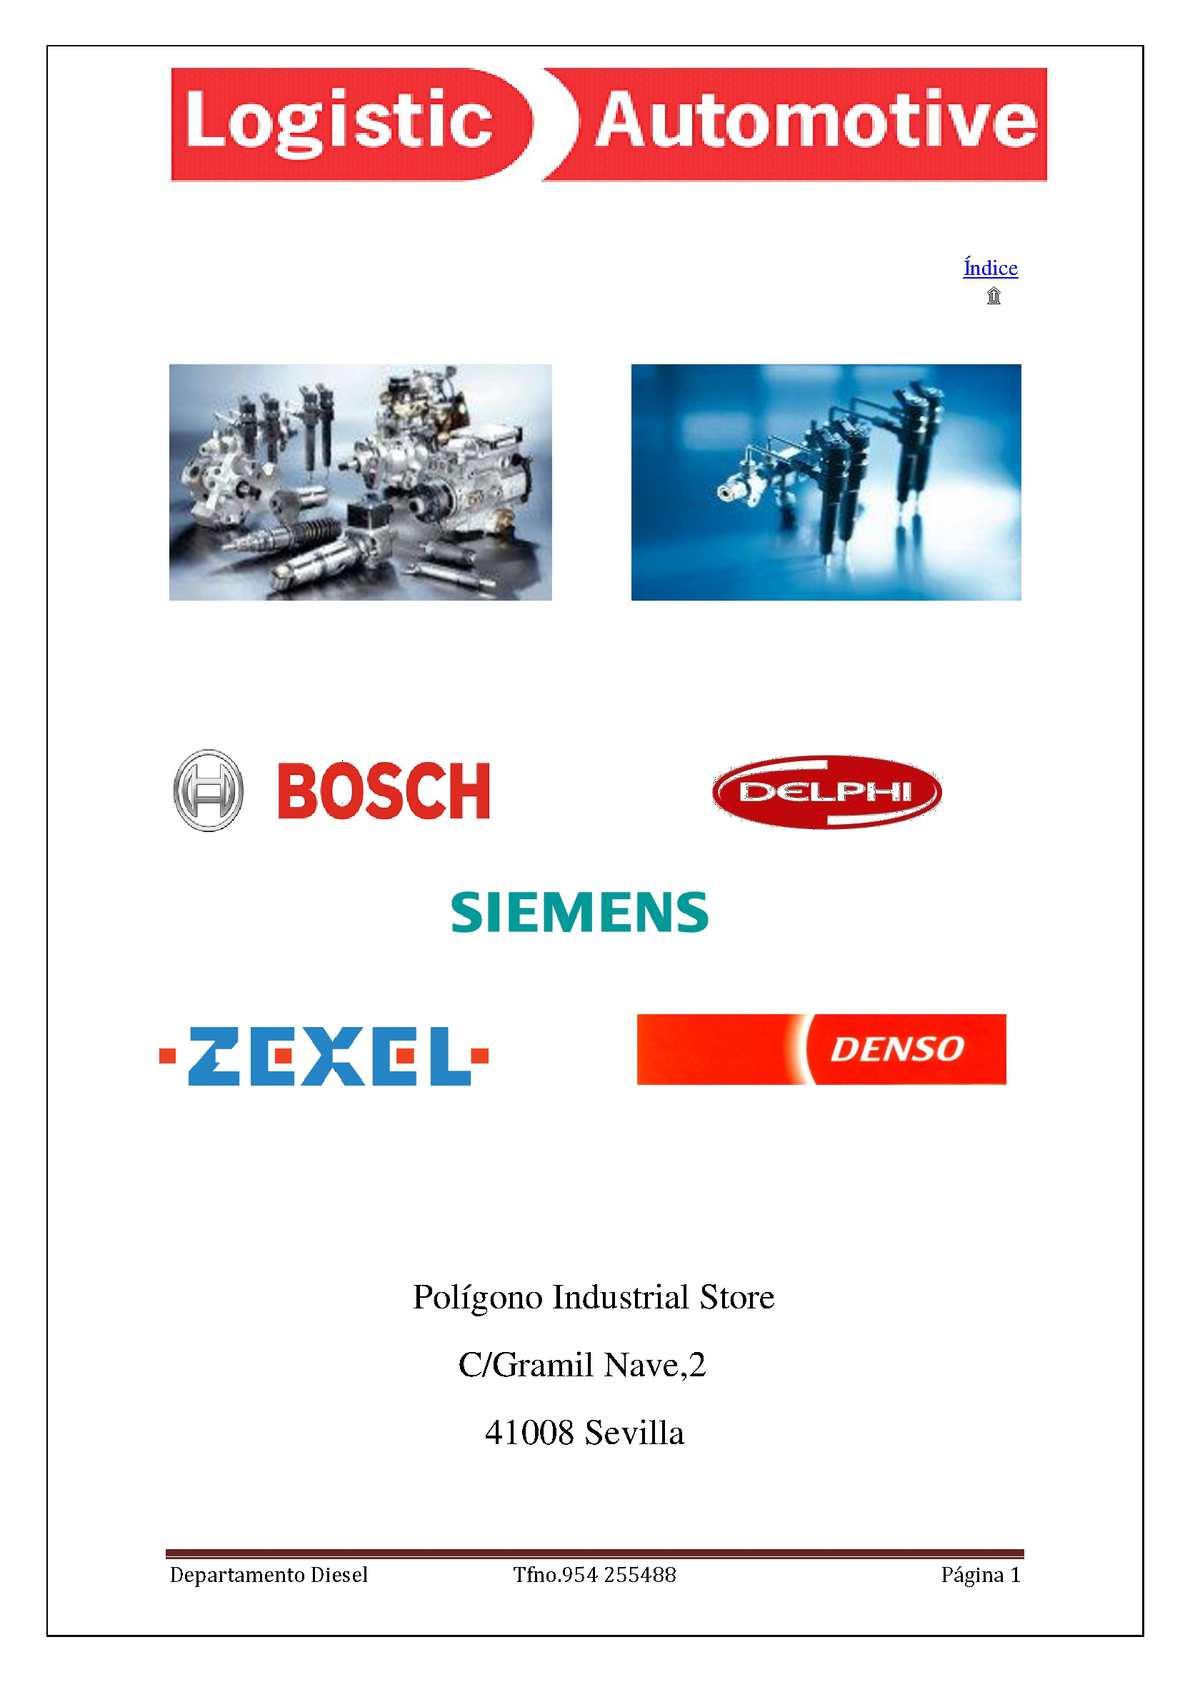 Peugeot Boxer 2.2 denso válvula de combustible Sensor Kit TDCi HDi Nuevo